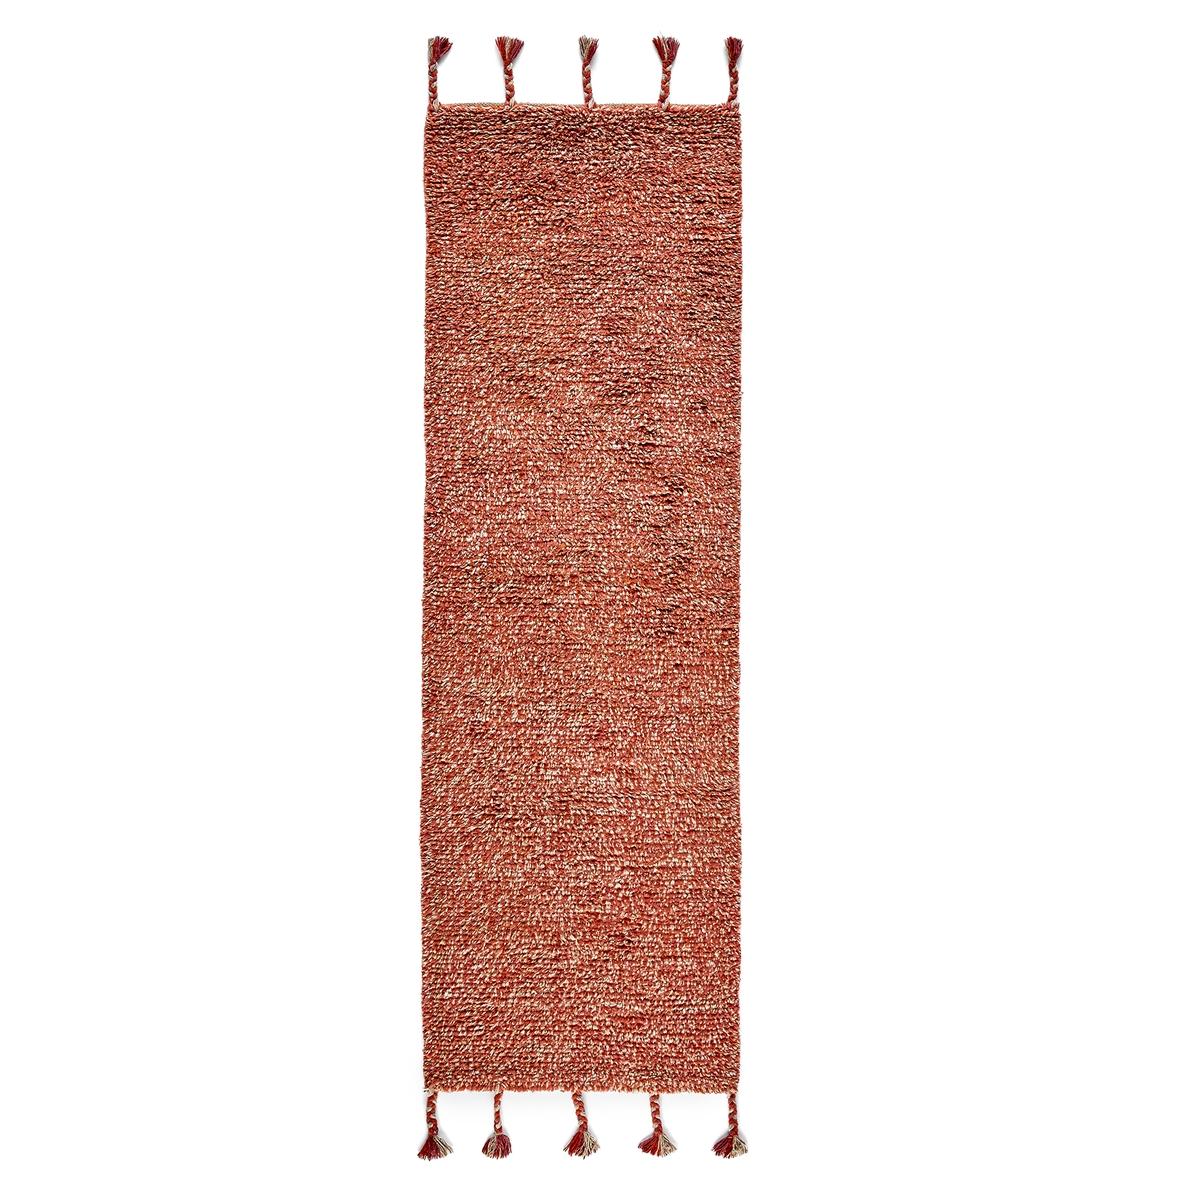 Ковер La Redoute Для коридора в берберском стиле Neroli 80 x 250 см бежевый ковер la redoute в берберском стиле из шерсти tekouma 120 x 180 см бежевый